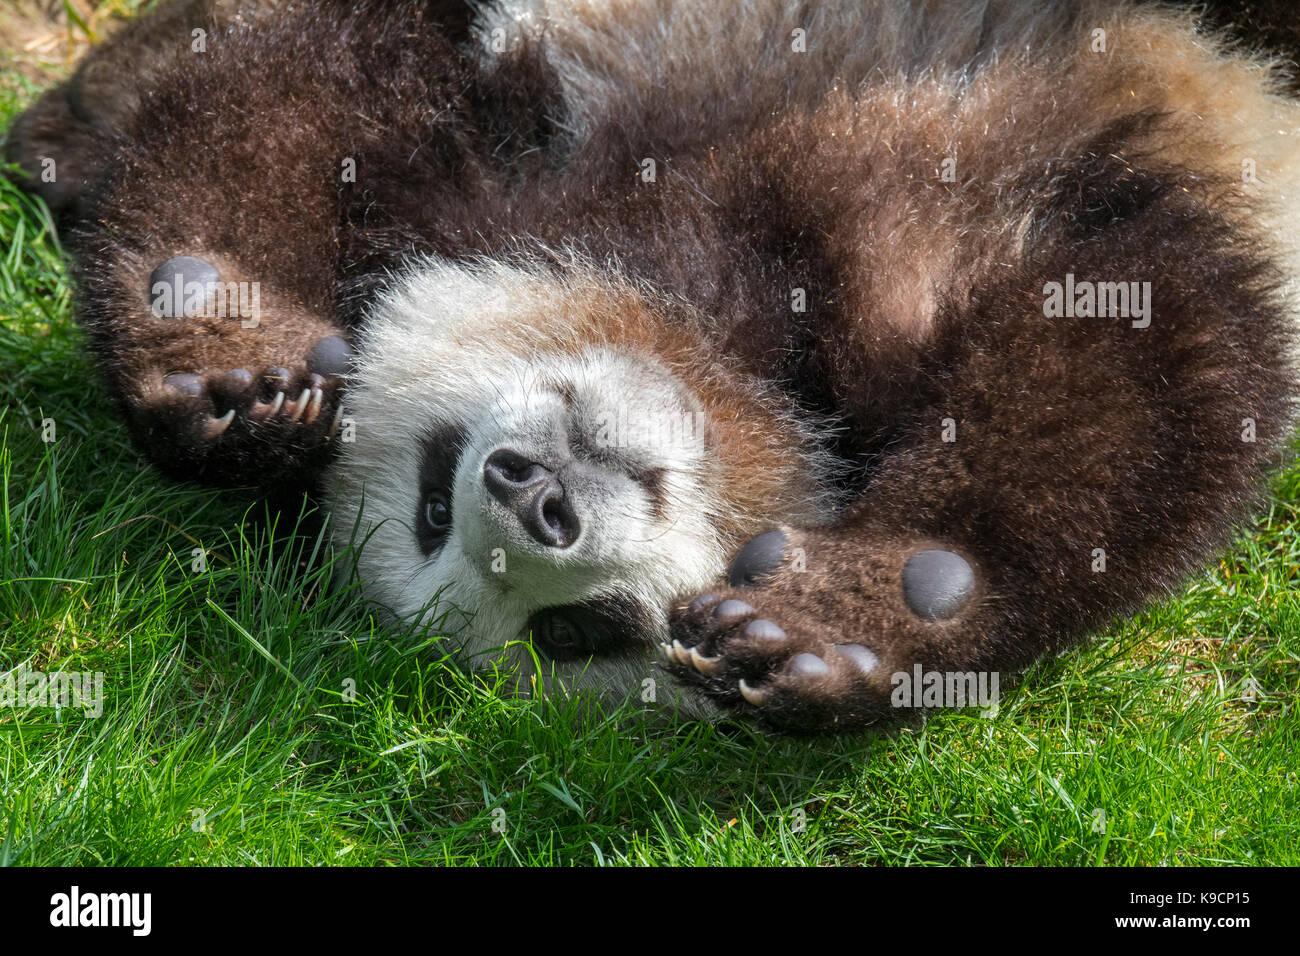 Giant panda (Ailuropoda melanoleuca) playful one-year old cub close up - Stock Image